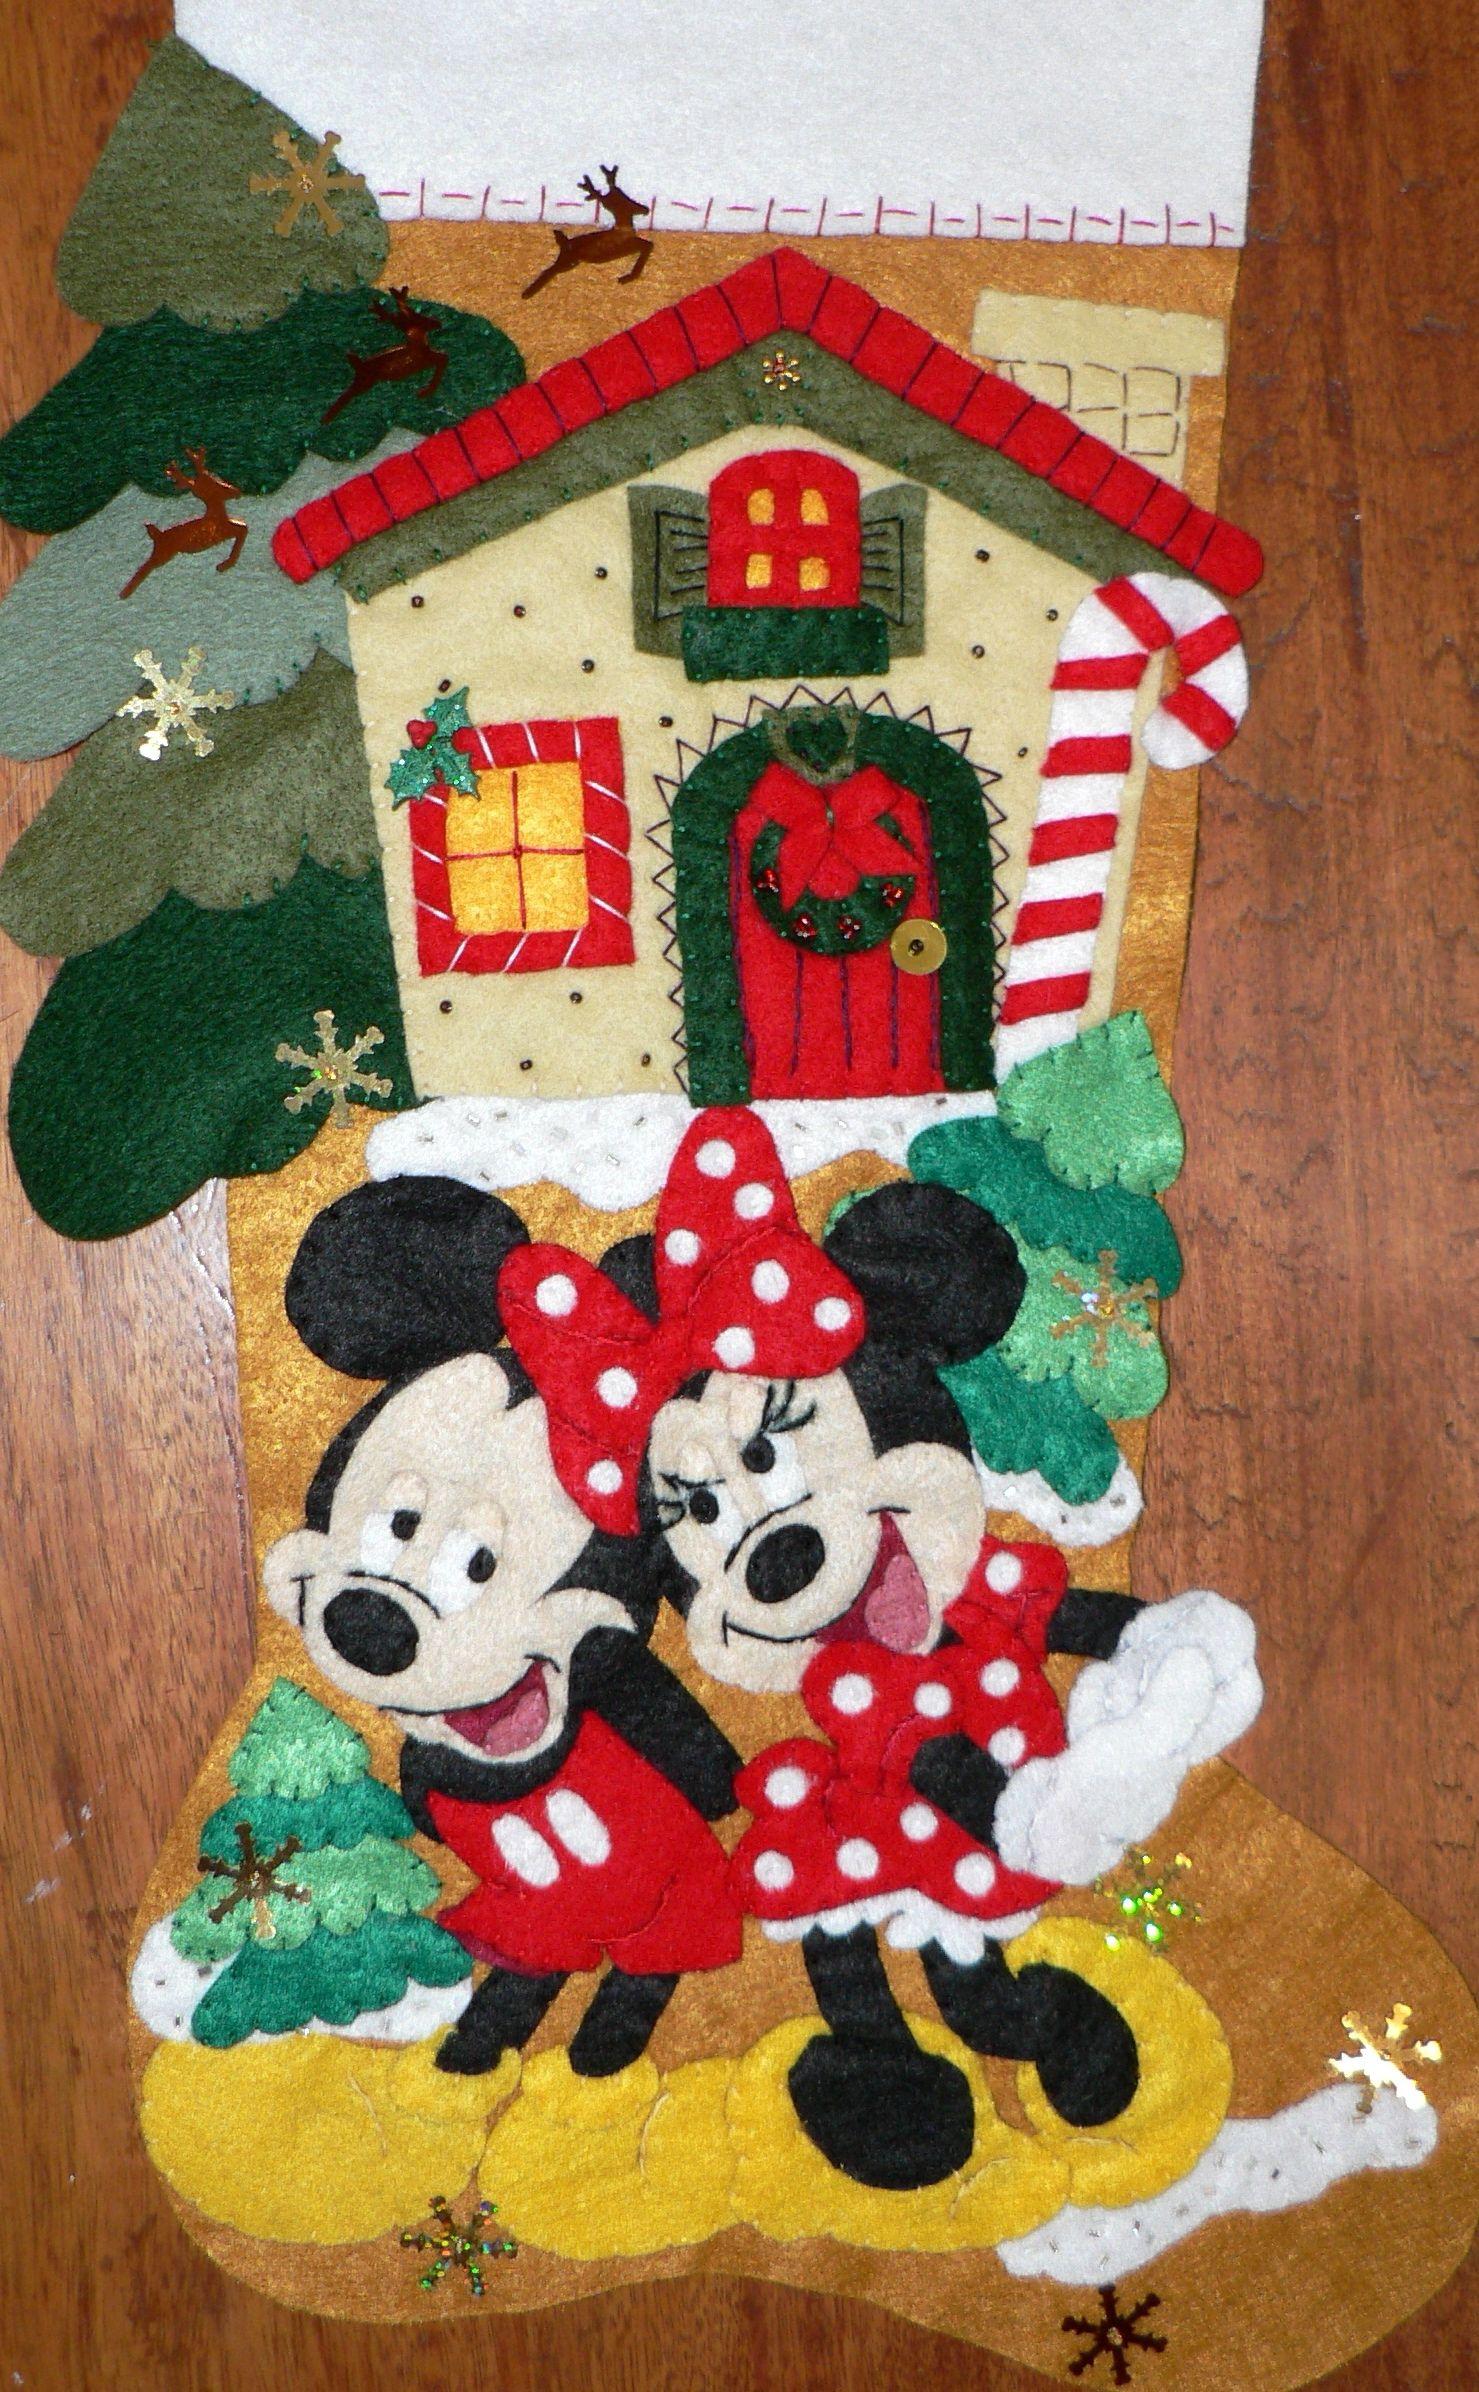 Minnie y mickey enamorados mikey mouse pinterest for Adornos navidenos mickey mouse